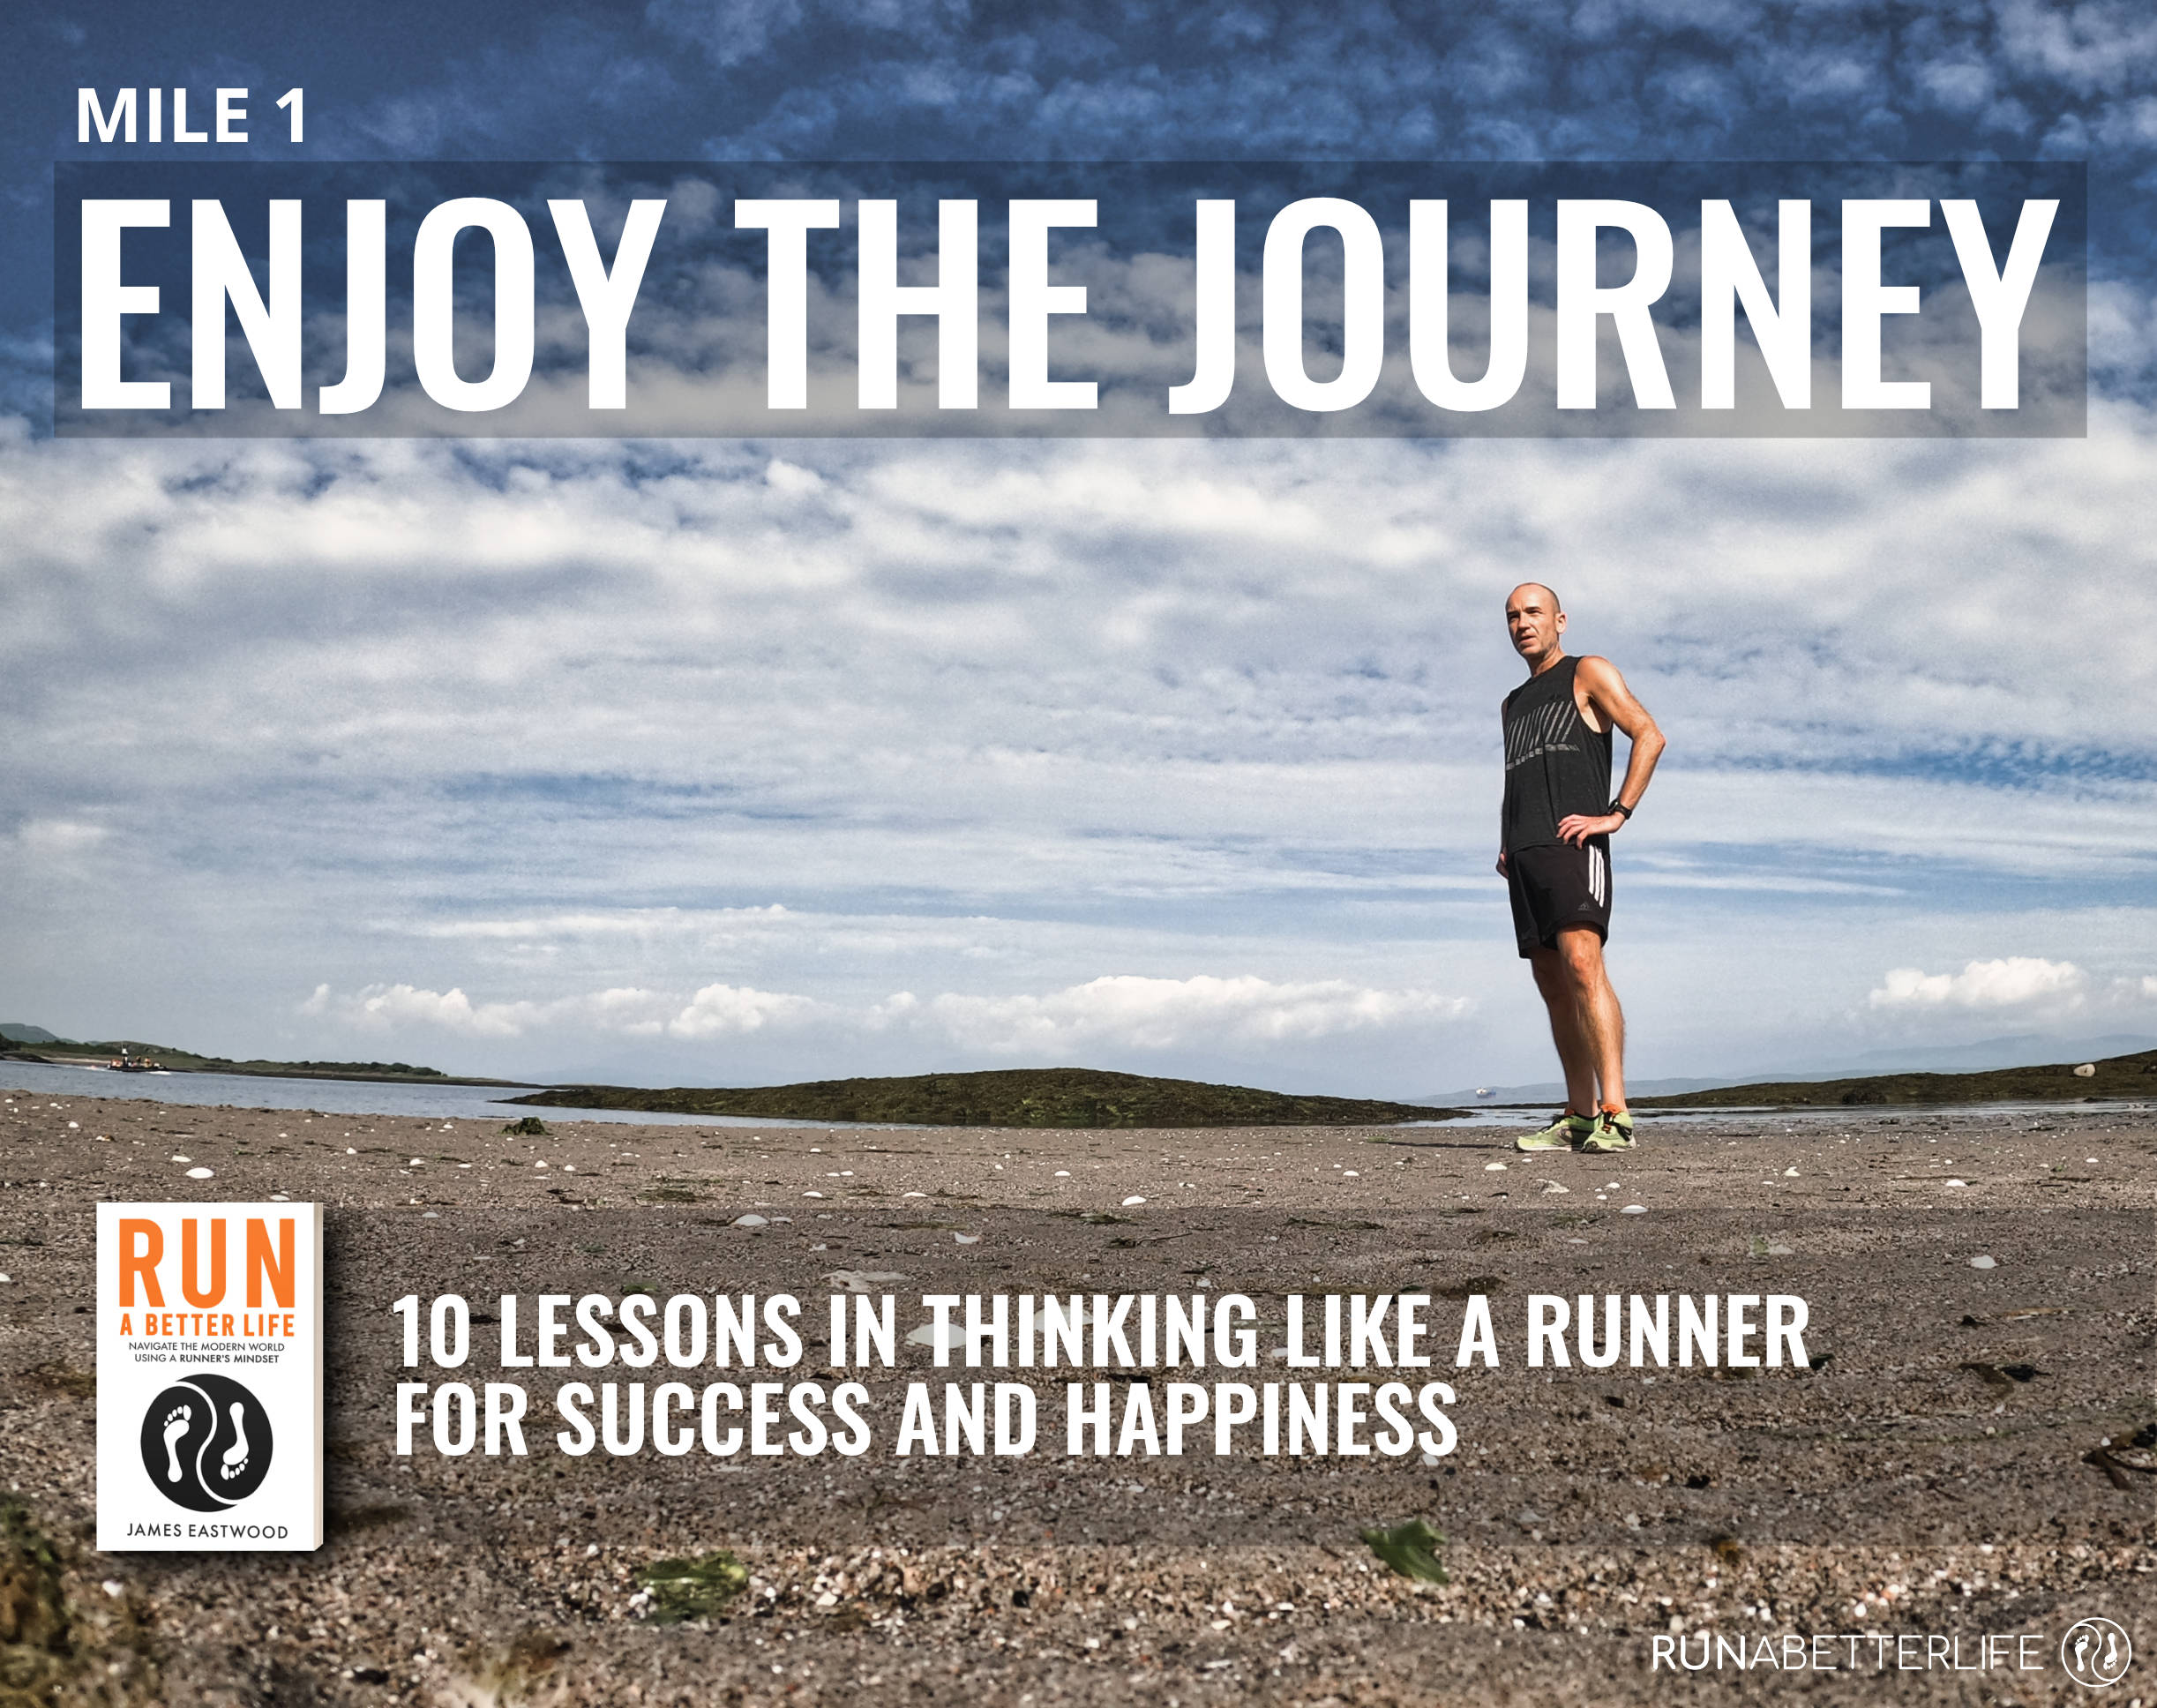 James Eastwood (Run a Better Life) - Enjoy the journey (mile 1)